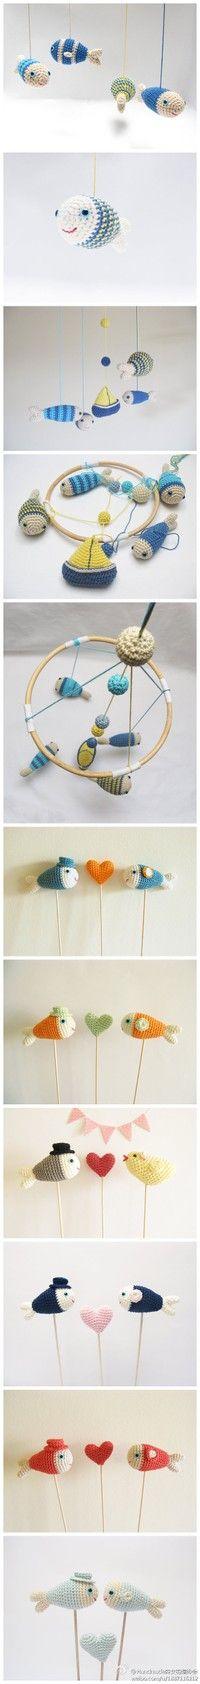 Mobile stuffed animals